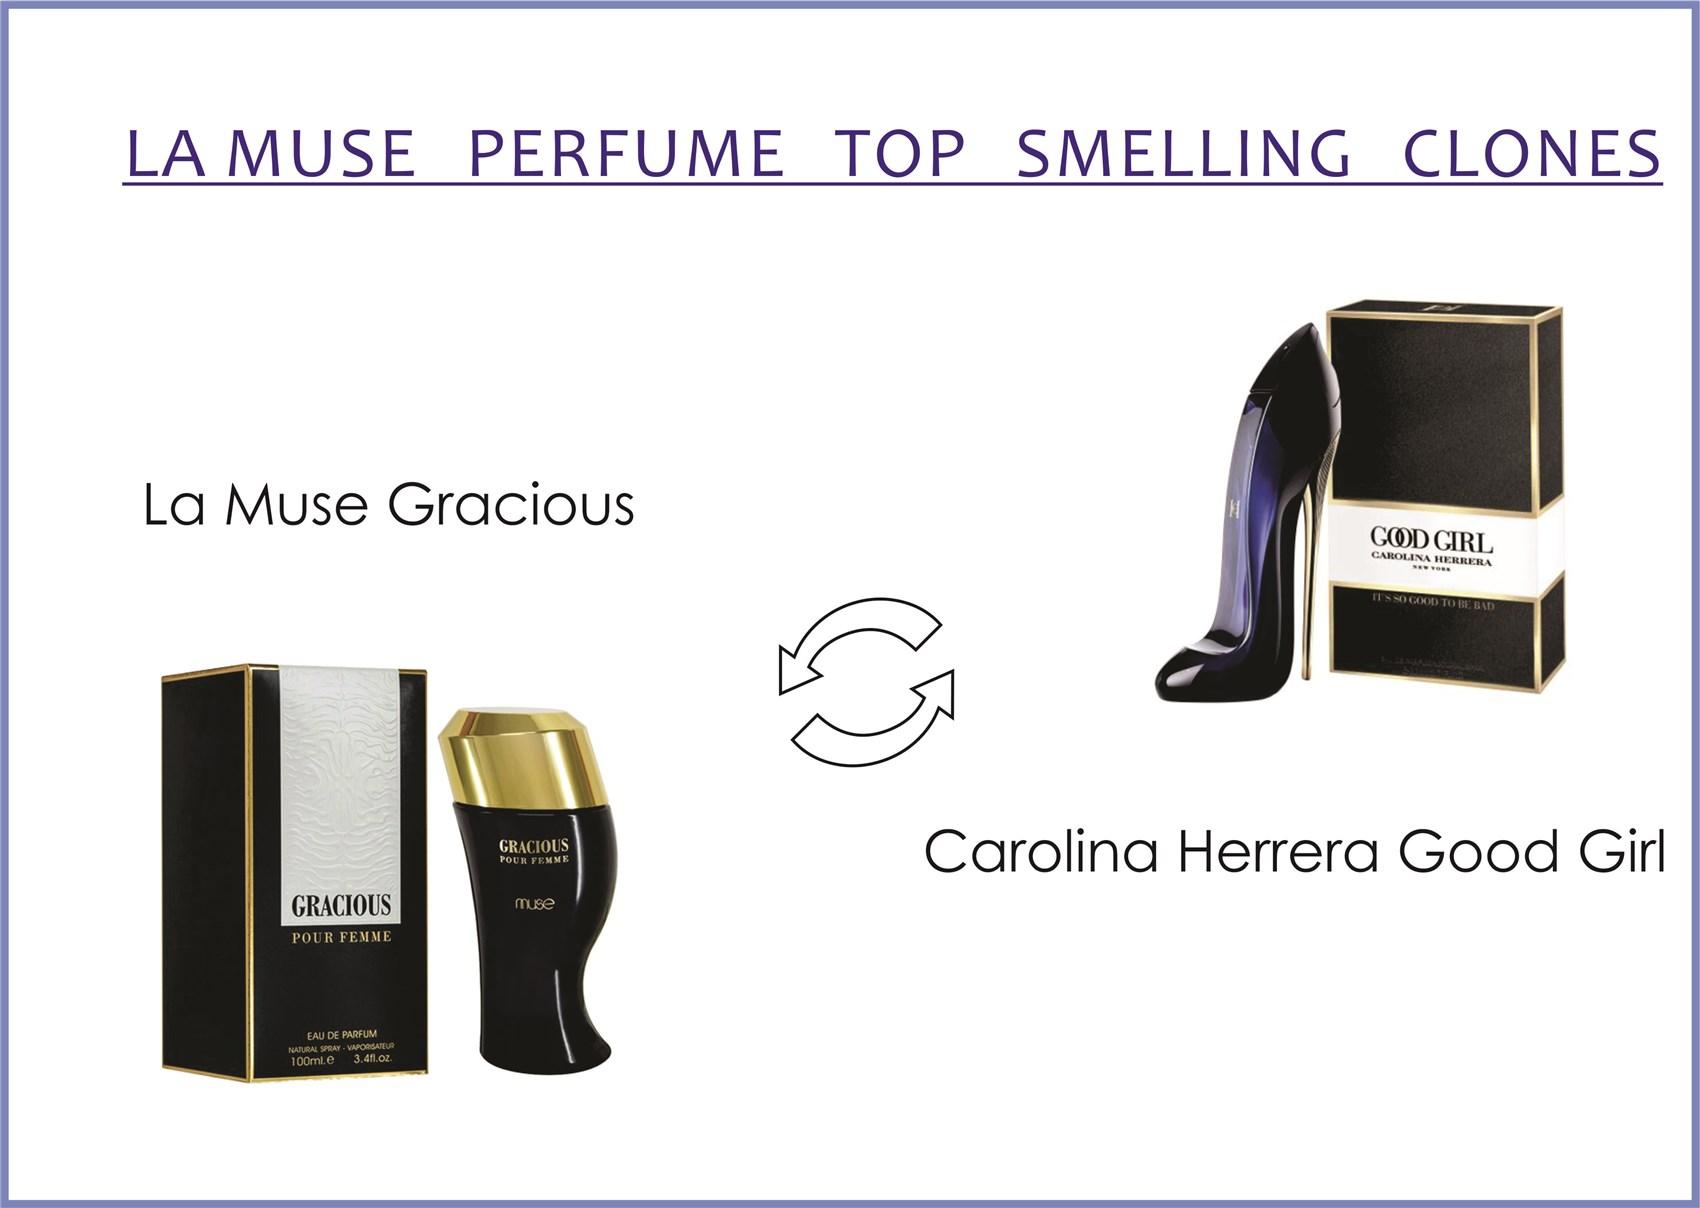 la-muse-gracious-for-women-100-ml-edp-by-lattafa-perfumes-carolina-herrera-good-girl-legere-perfume-for-women-80-ml-edp